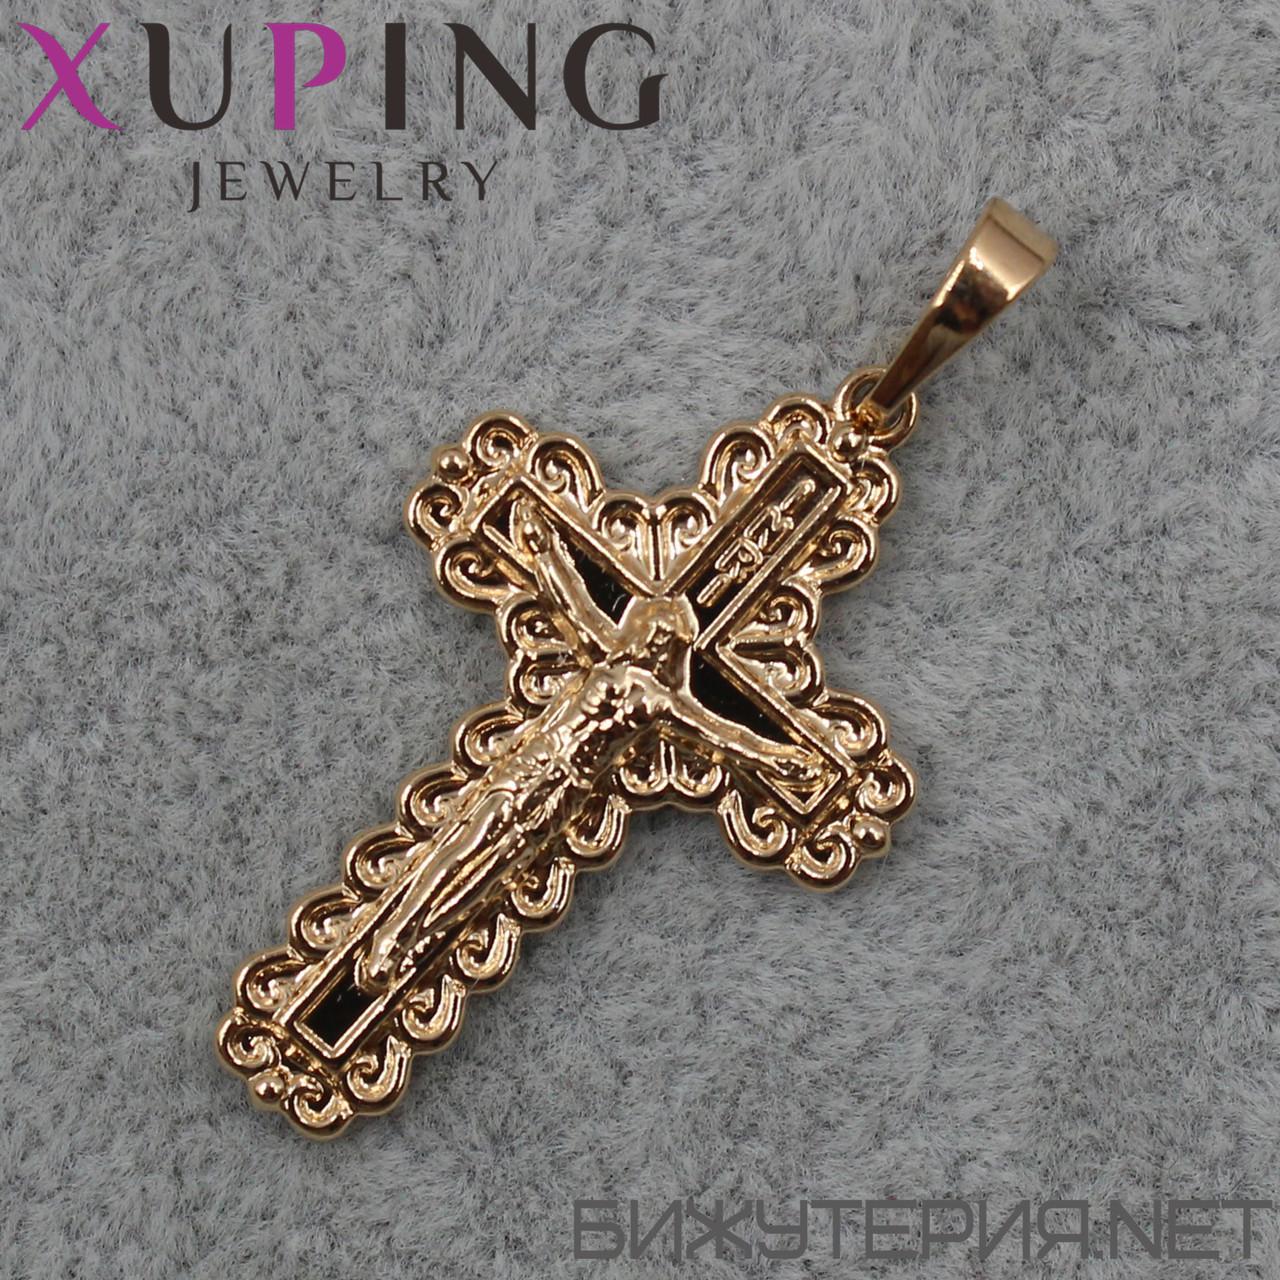 Крестик Xuping медицинское золото 30 х 20 мм